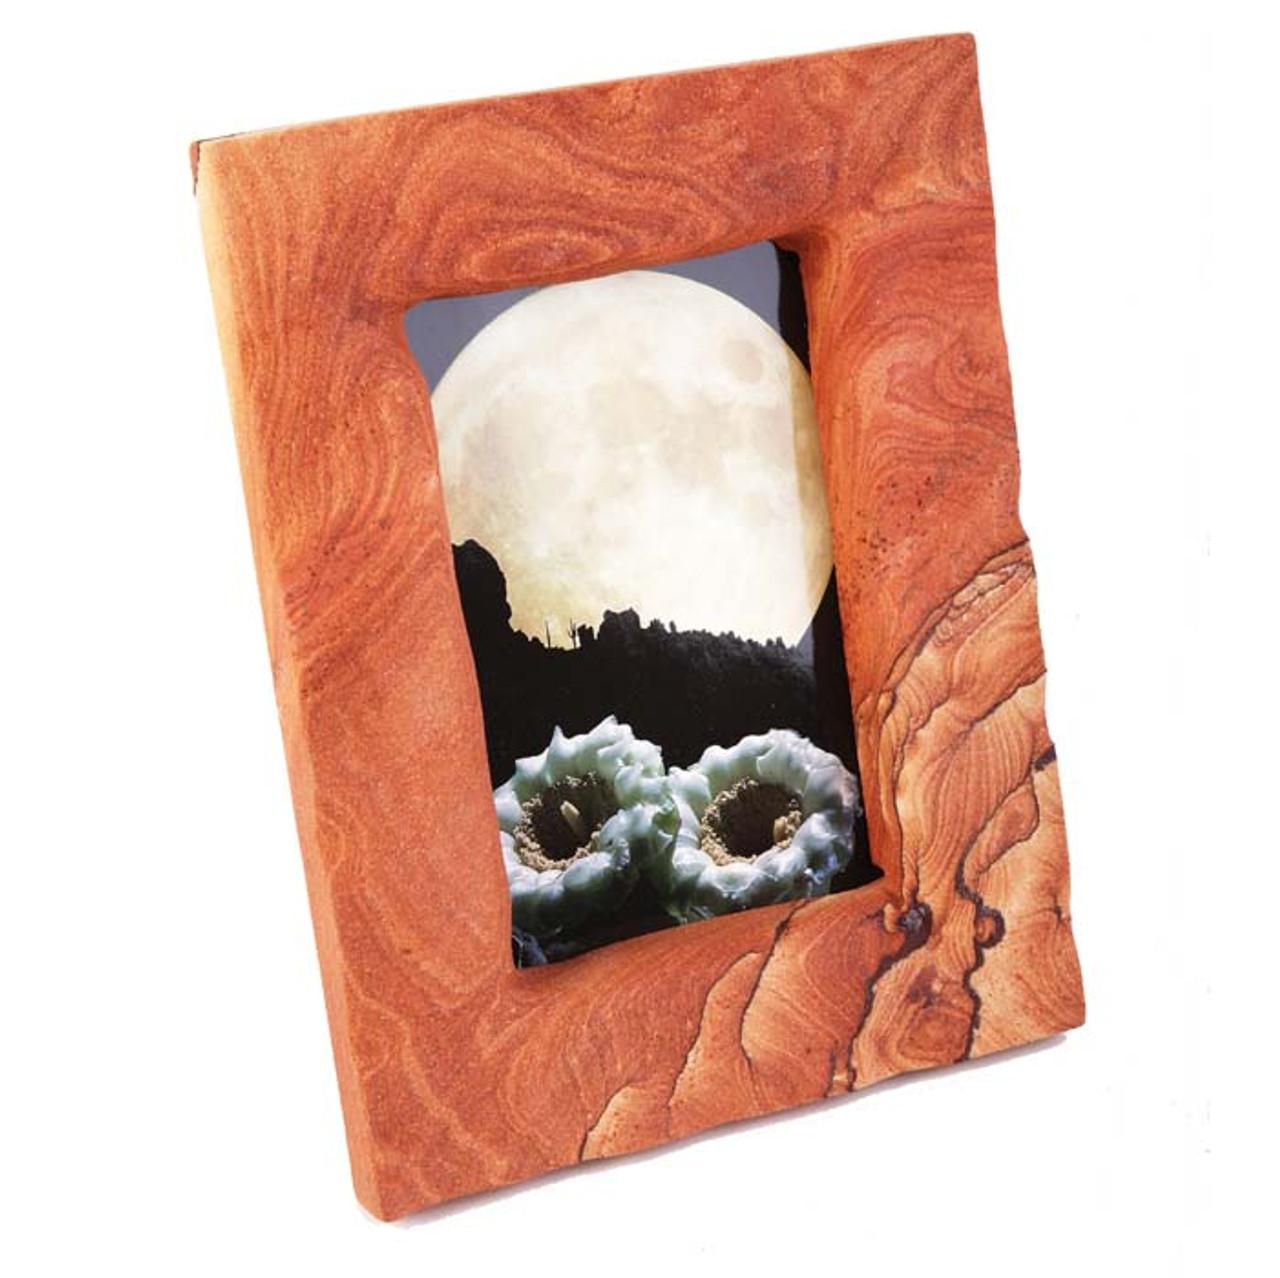 Sandstone Picture Frame - Portrait